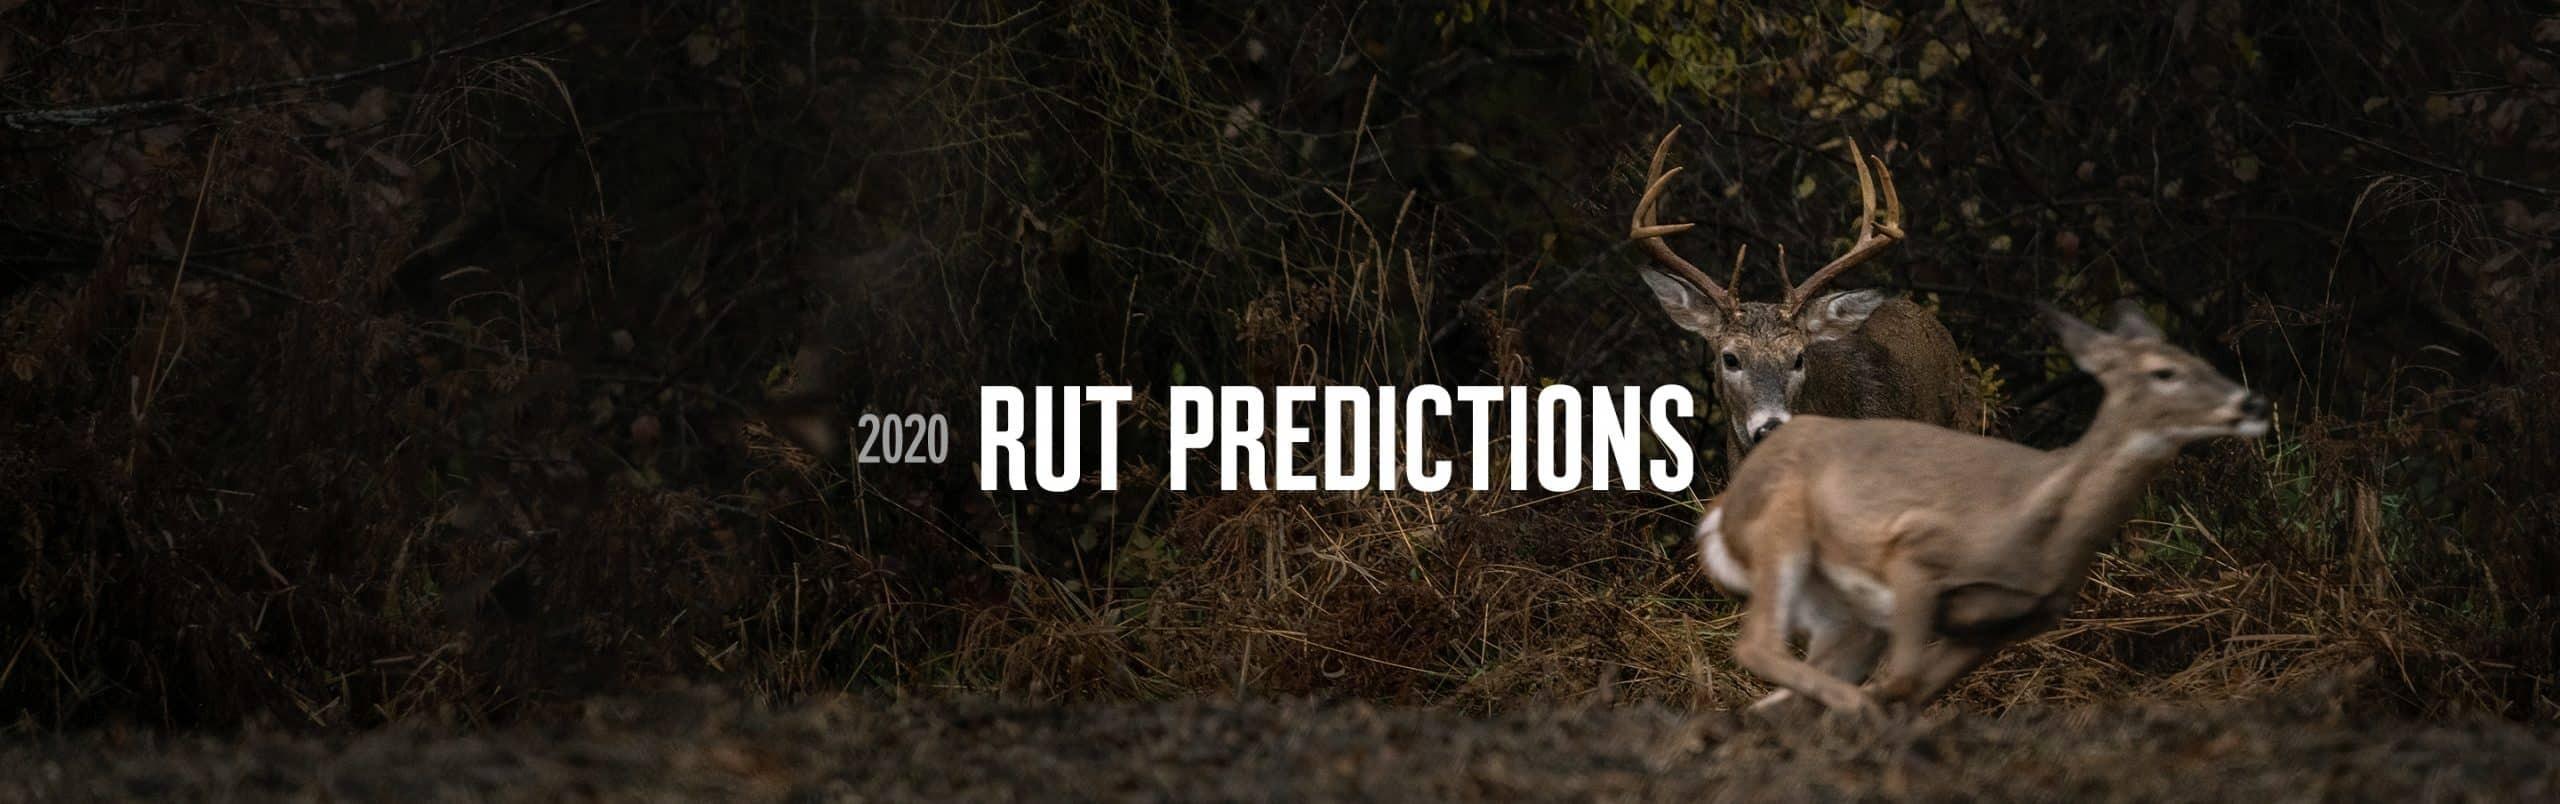 2020 Rut Predictions | Onx Maps  Ny Rut Calculater 2021